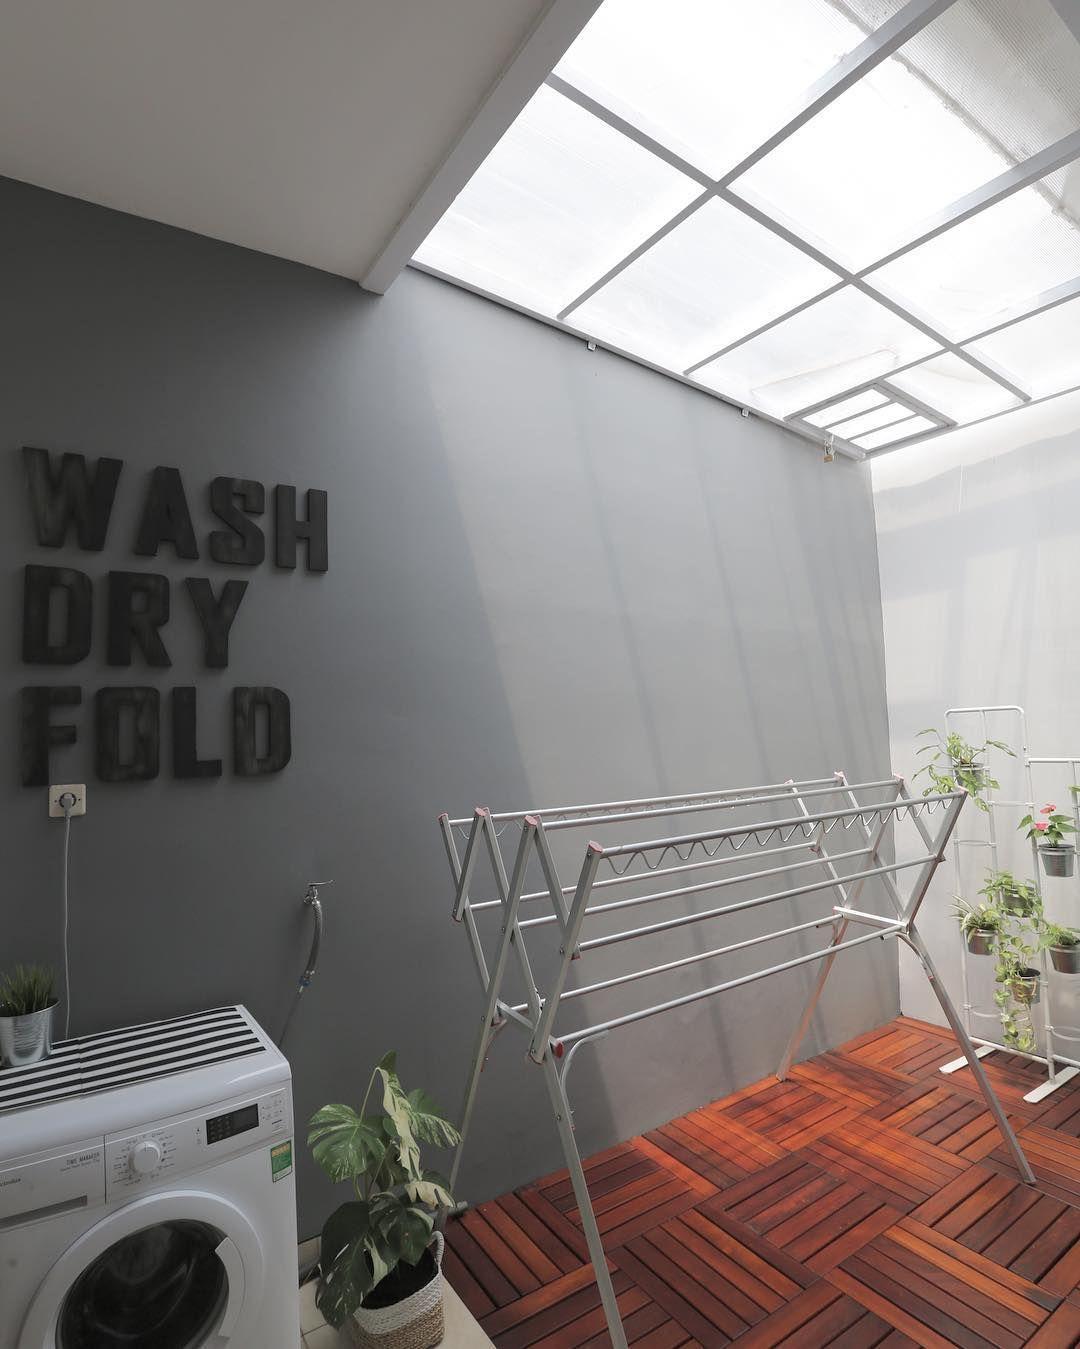 Best Laundry Room Design Ideas Laundryroomdesignideas Laundryroom Outdoor Laundry Rooms Room Design House Design Laundry room design ideas